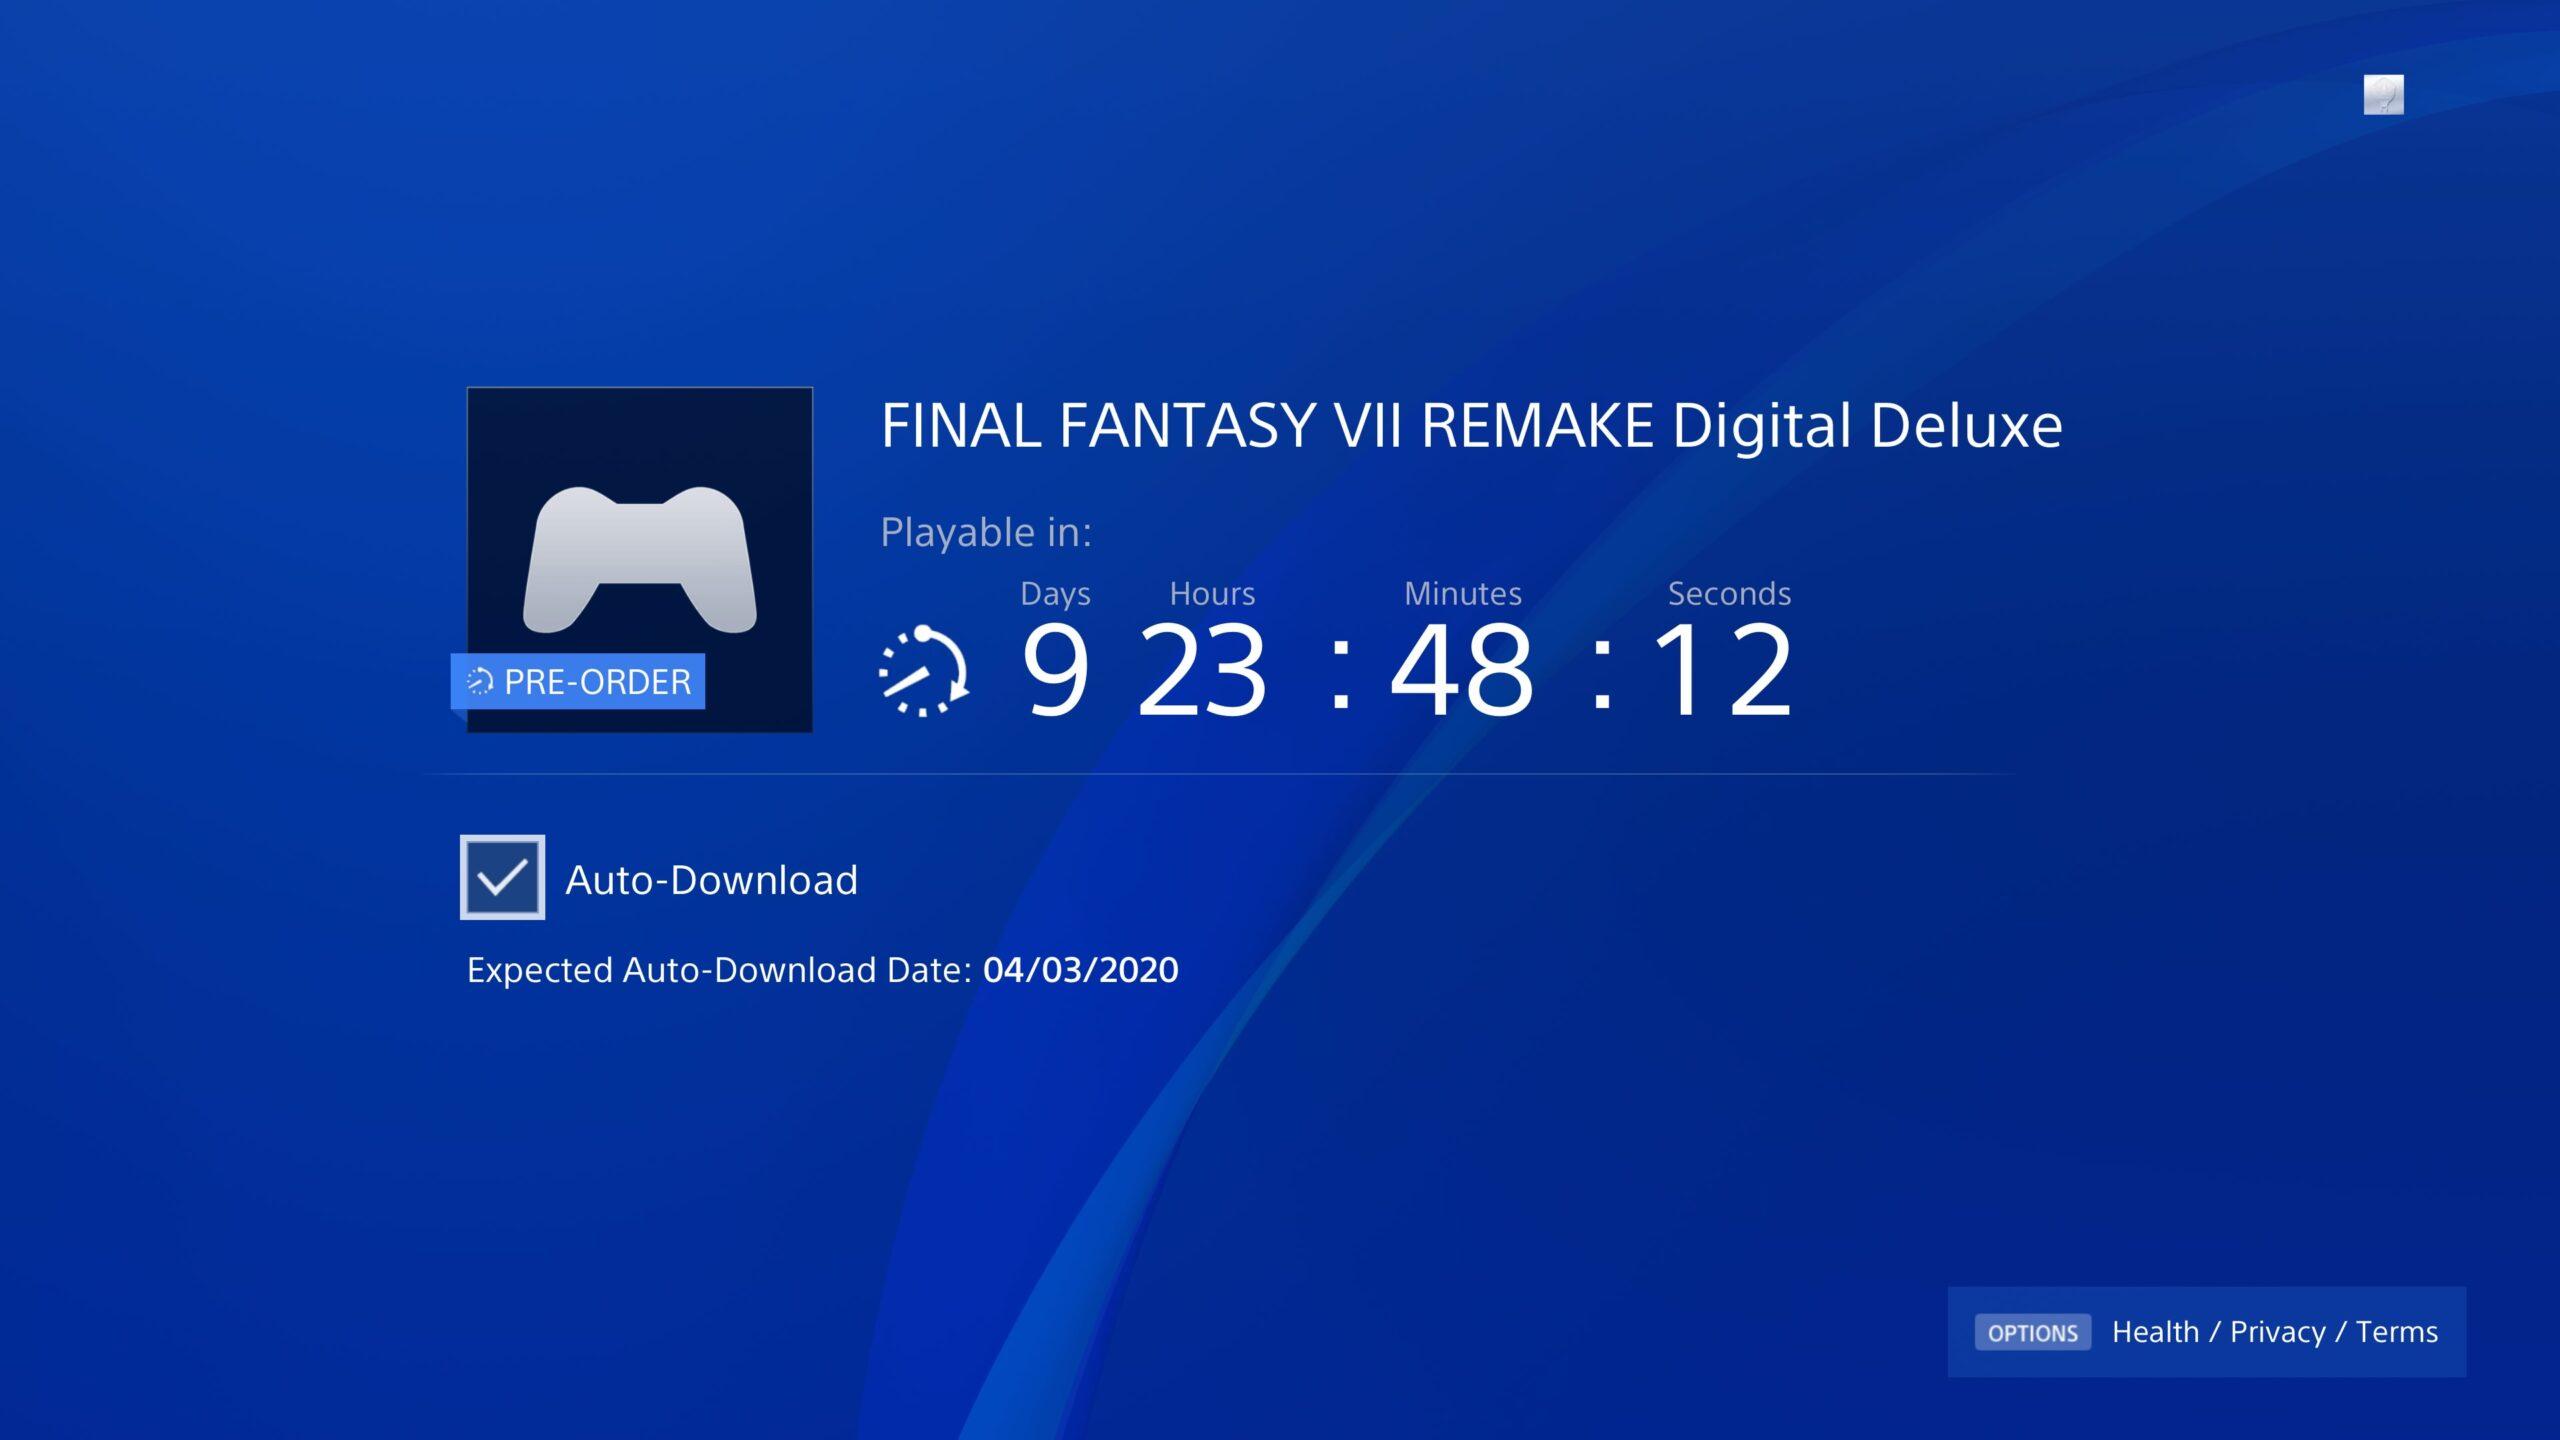 final fantasy vii remake pre-load